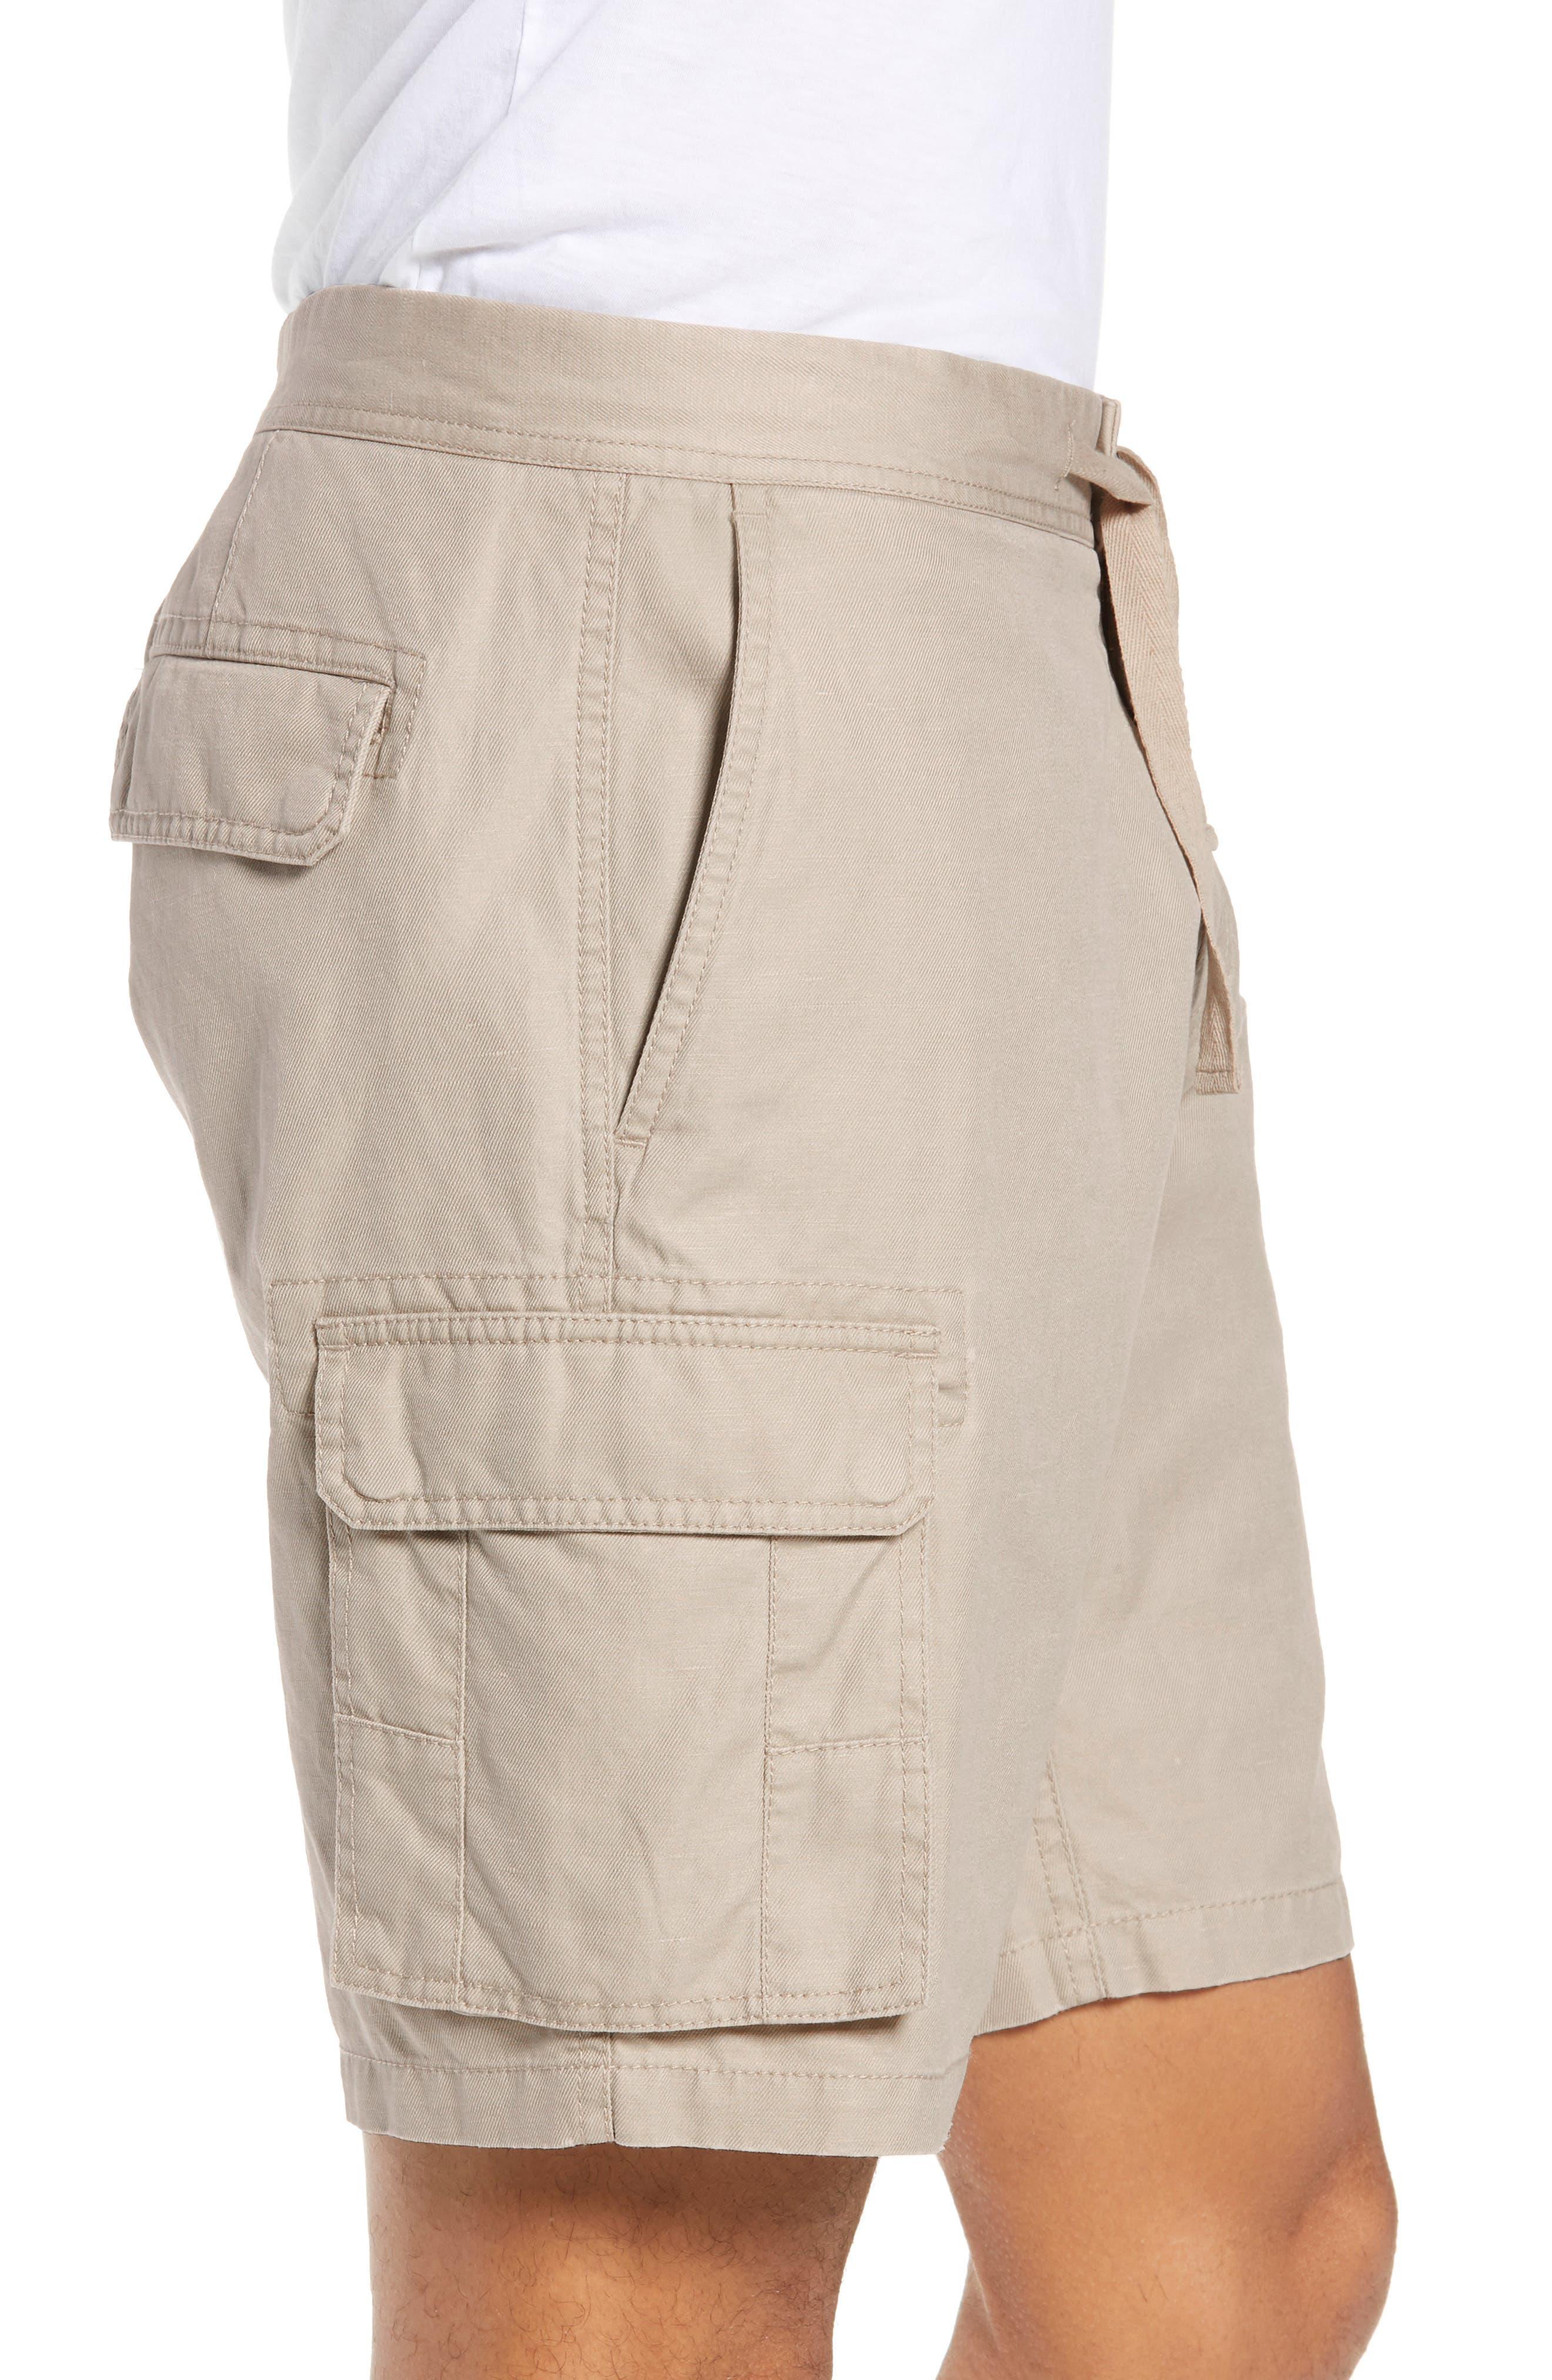 Sandyford Cargo Shorts,                             Alternate thumbnail 3, color,                             NATURAL